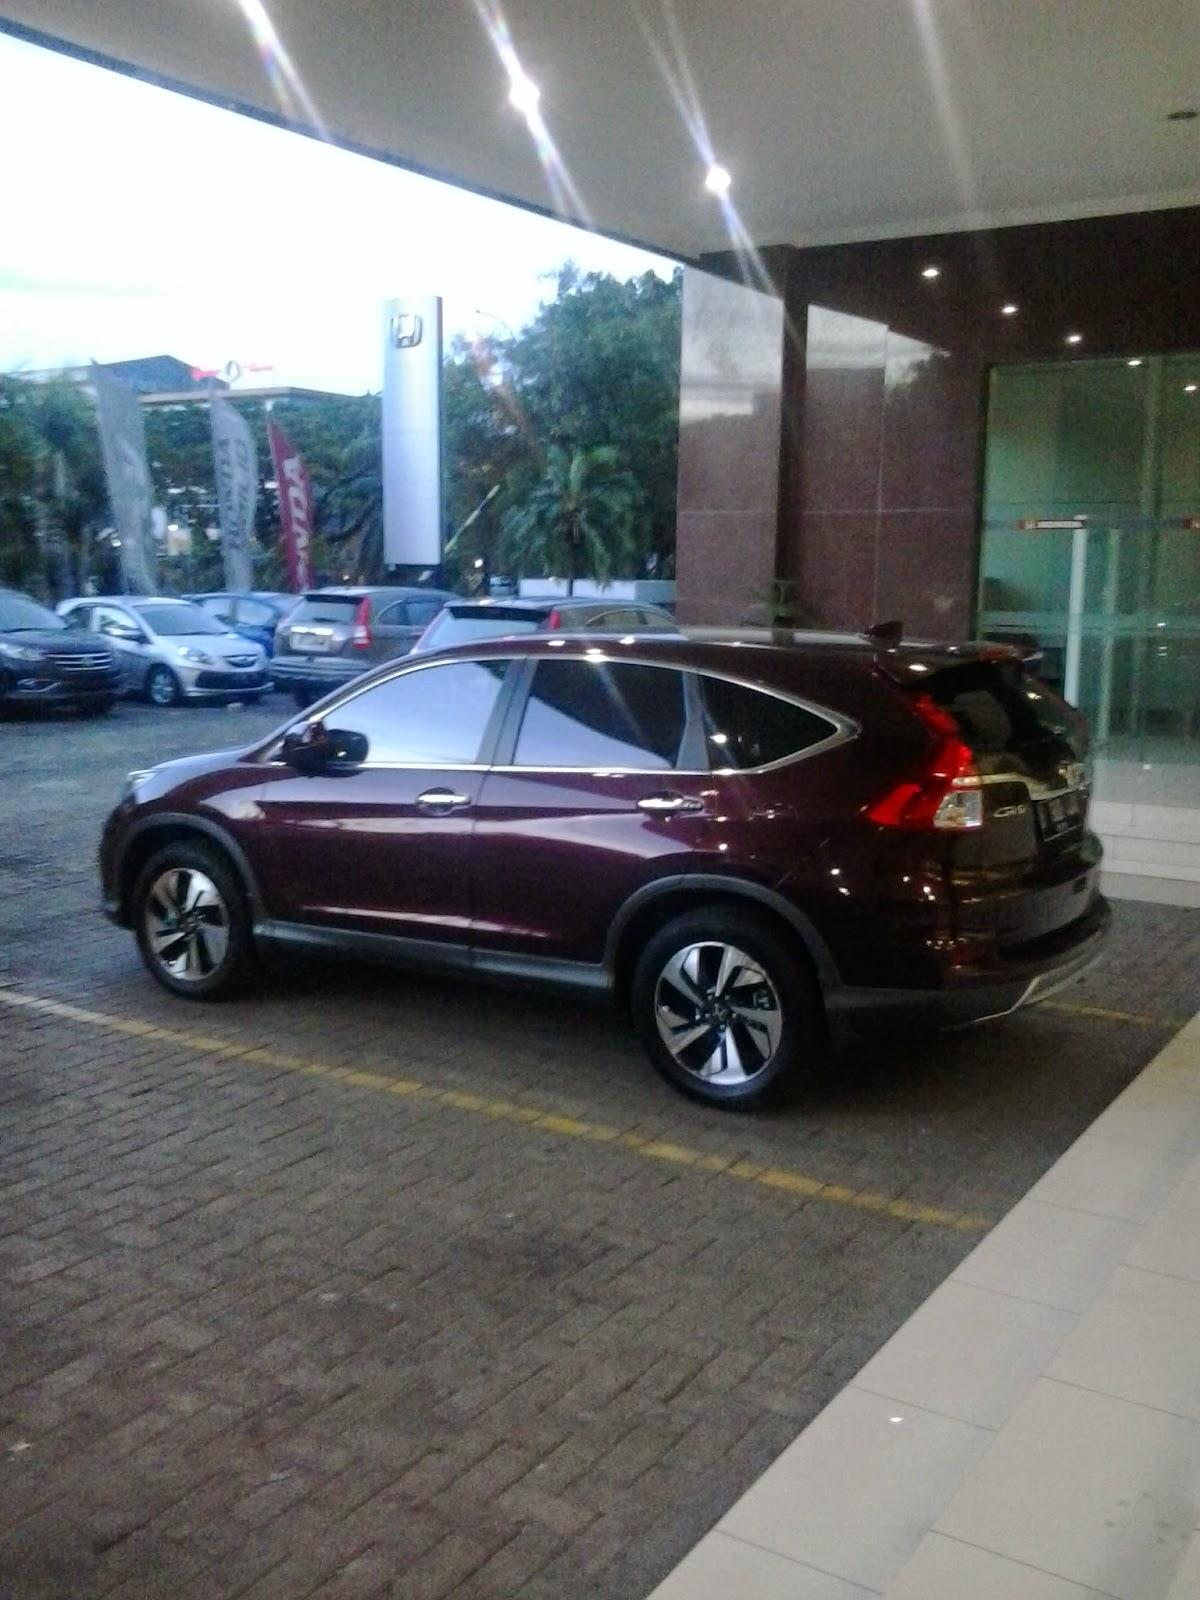 Sukakarya - Honda Sukakarya - Sales Honda Sukakarya